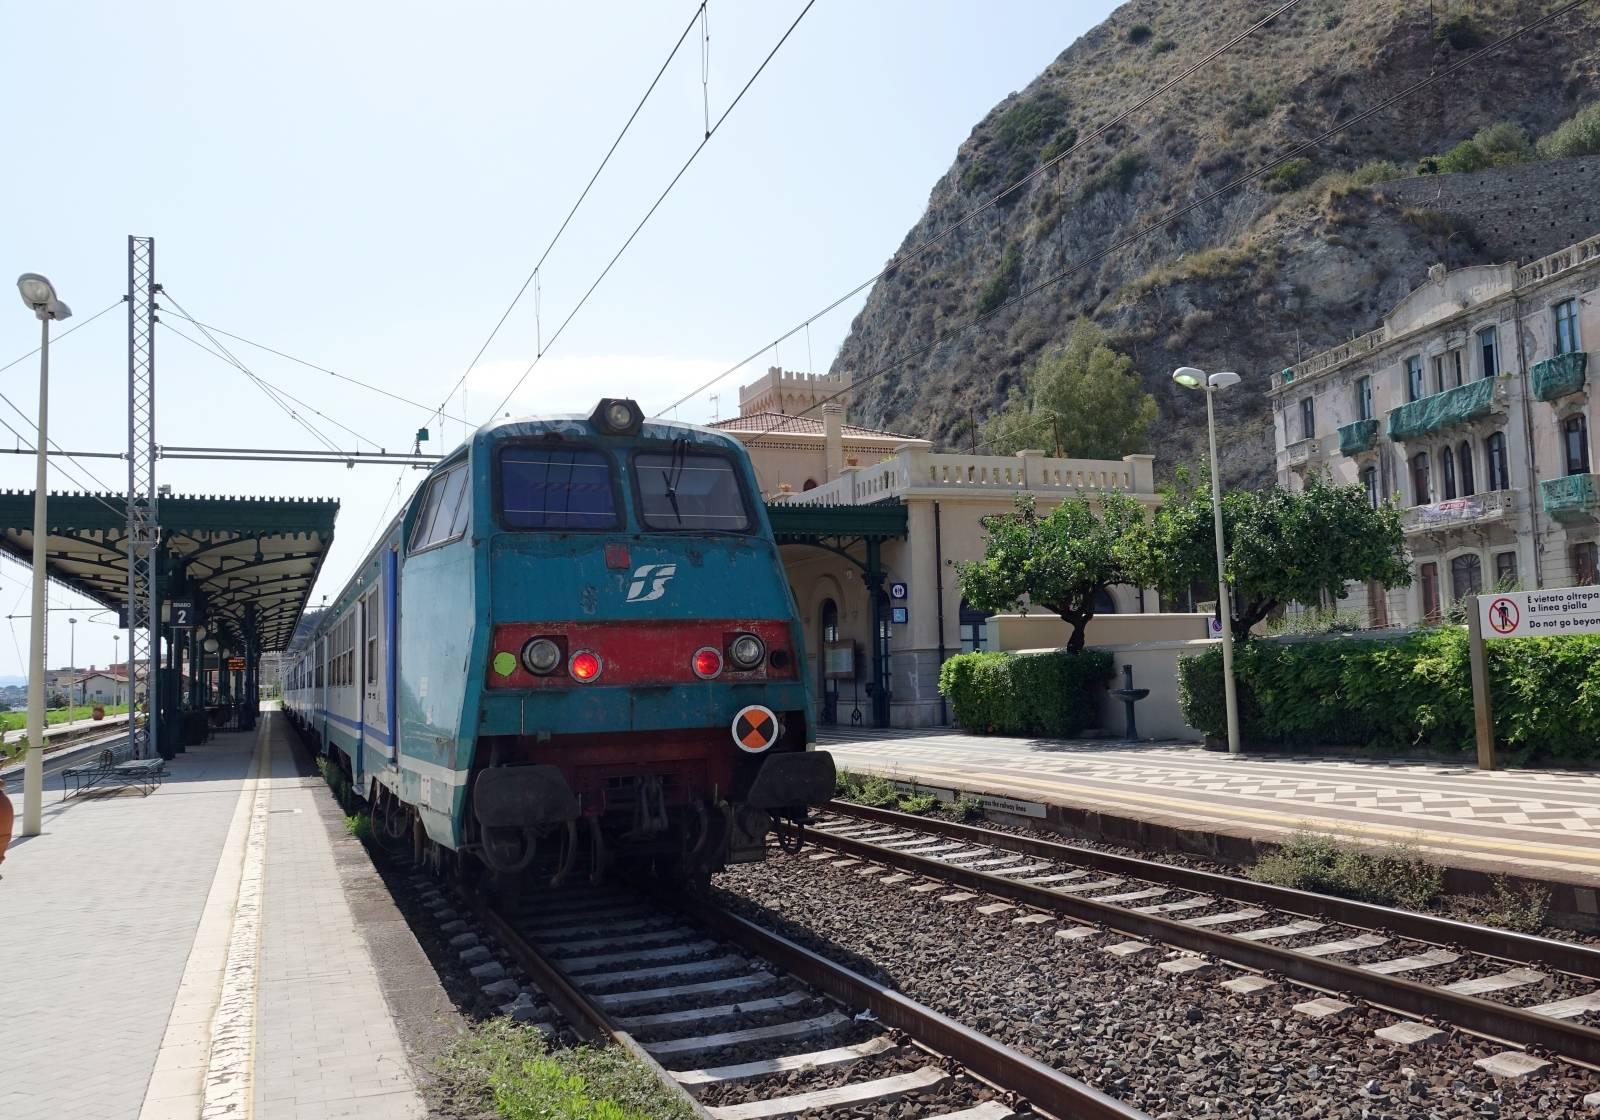 Sicily - Taormina-Giardini Station